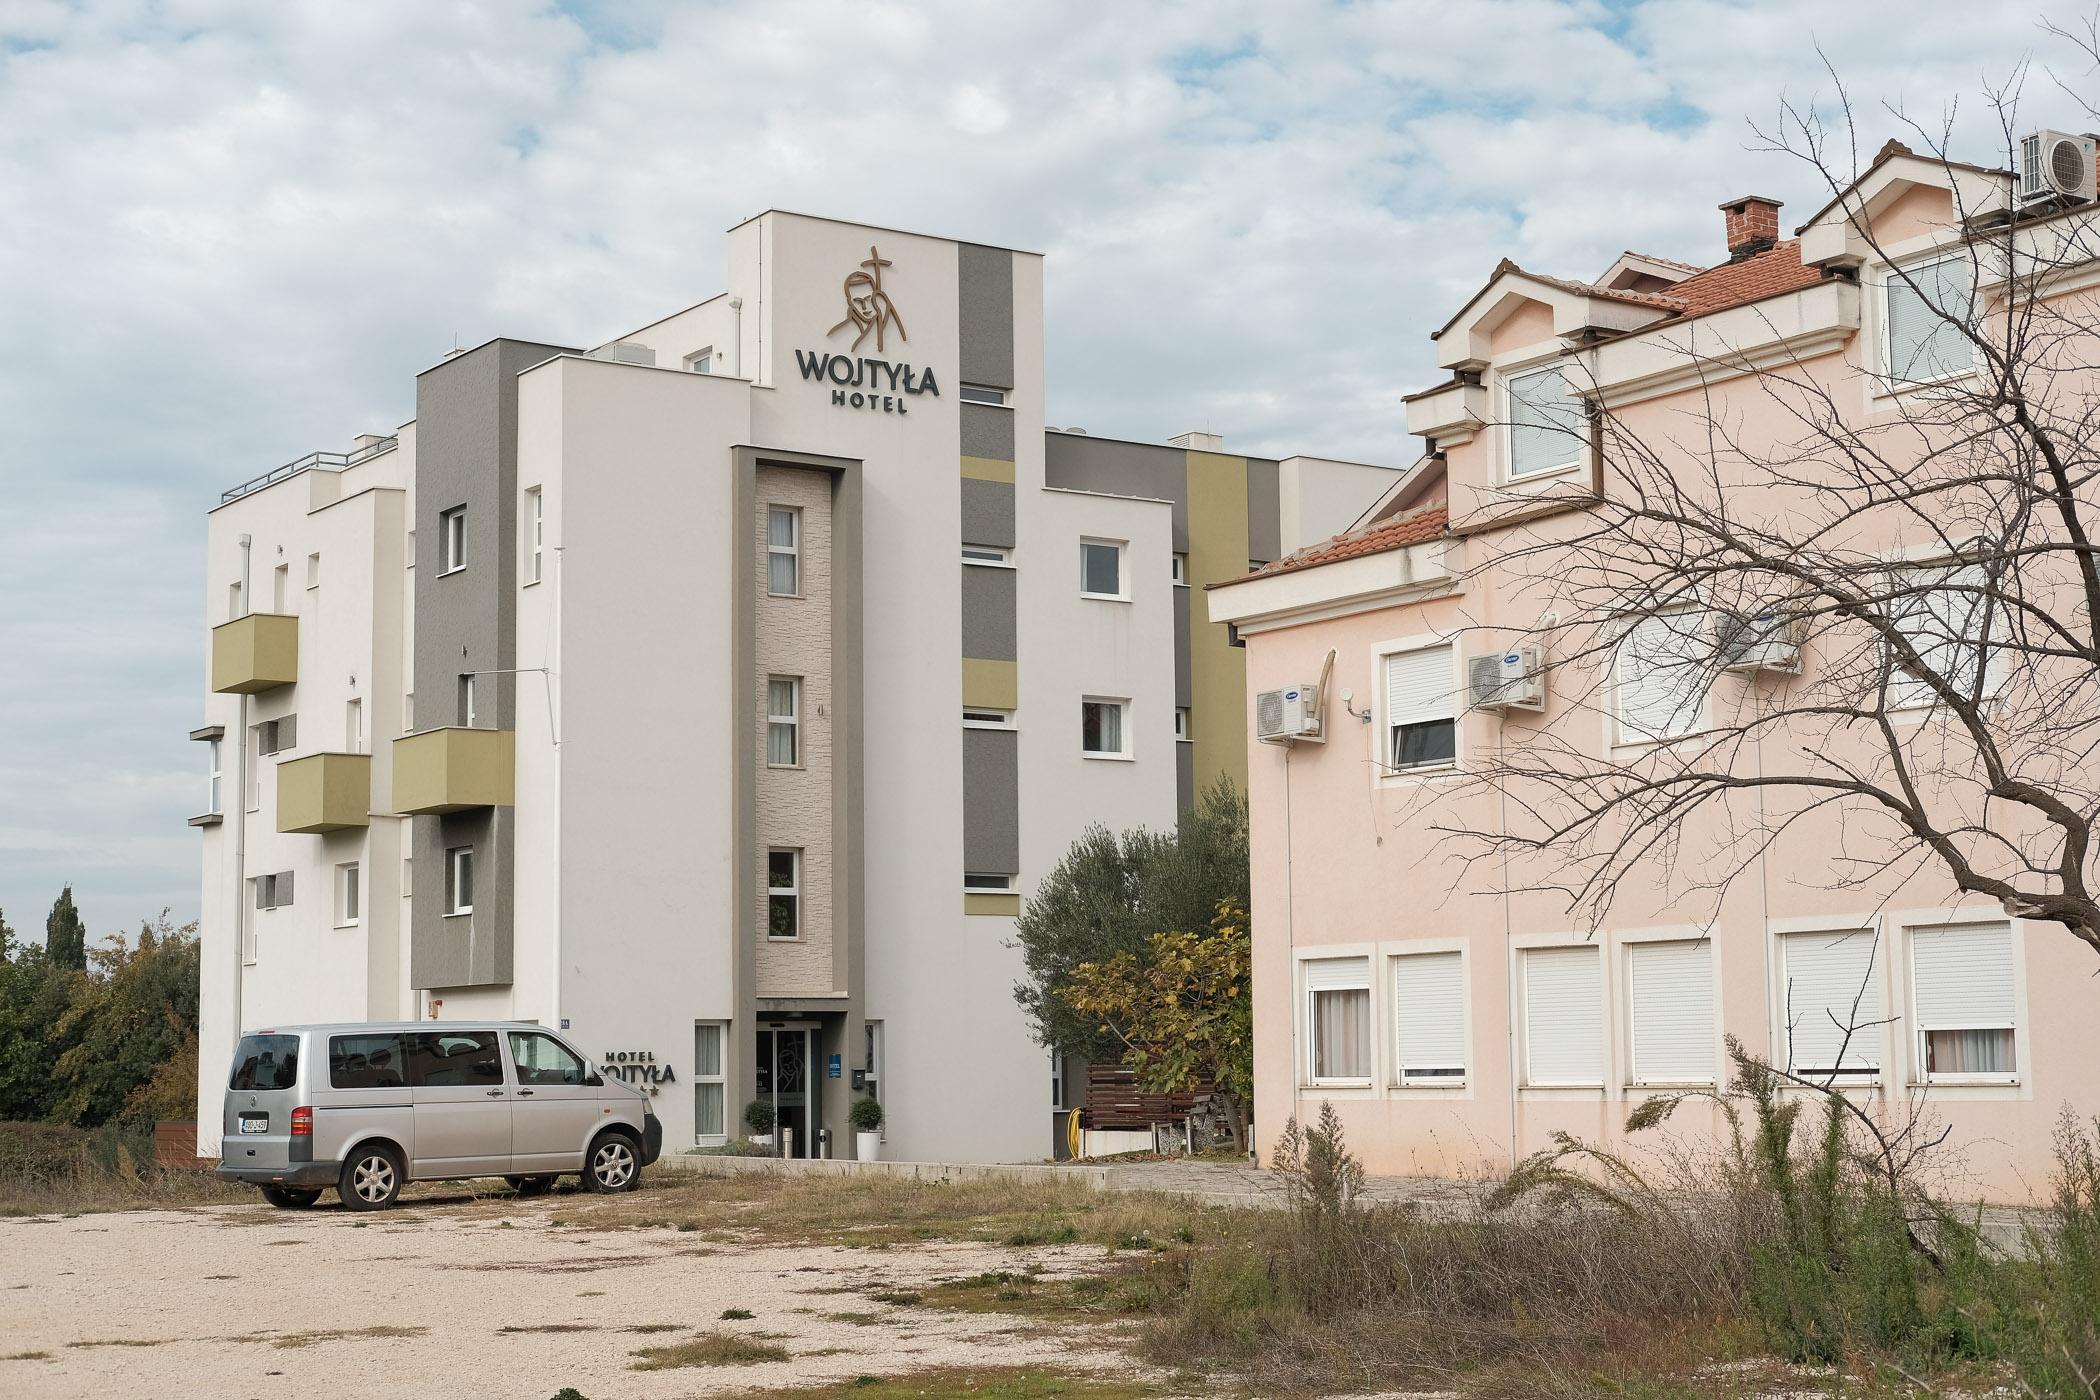 A hotel catering to Polish pilgrims, Medjugorje, Bosnia and Herzegovina.